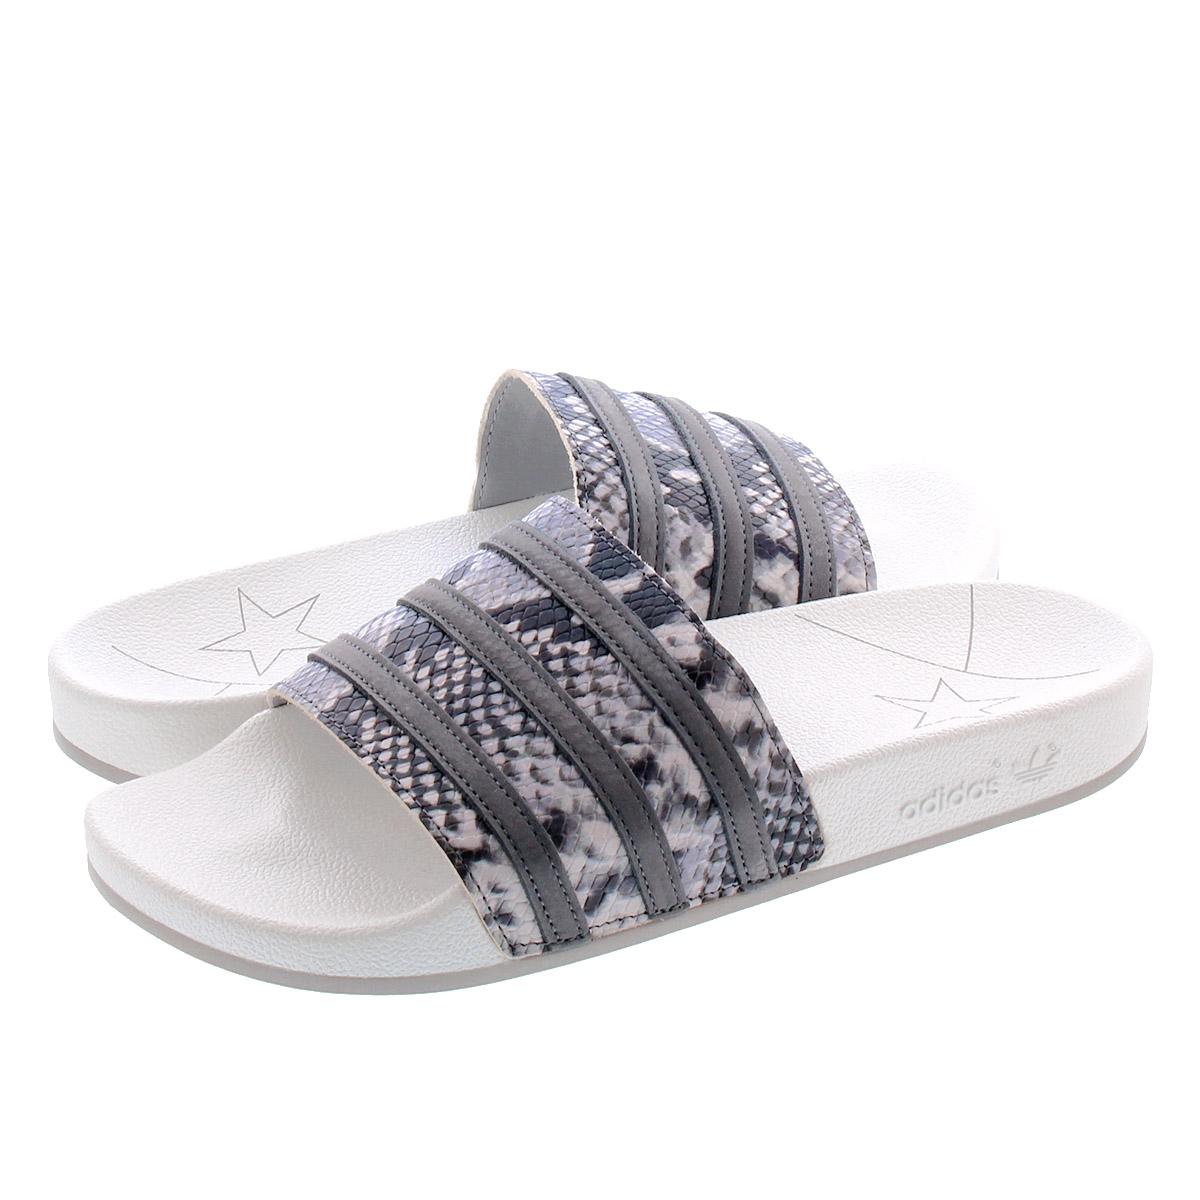 adidas ADILETTE ??????????? CRYSTAL WHITEGREY FOURGREY TWO eh0166